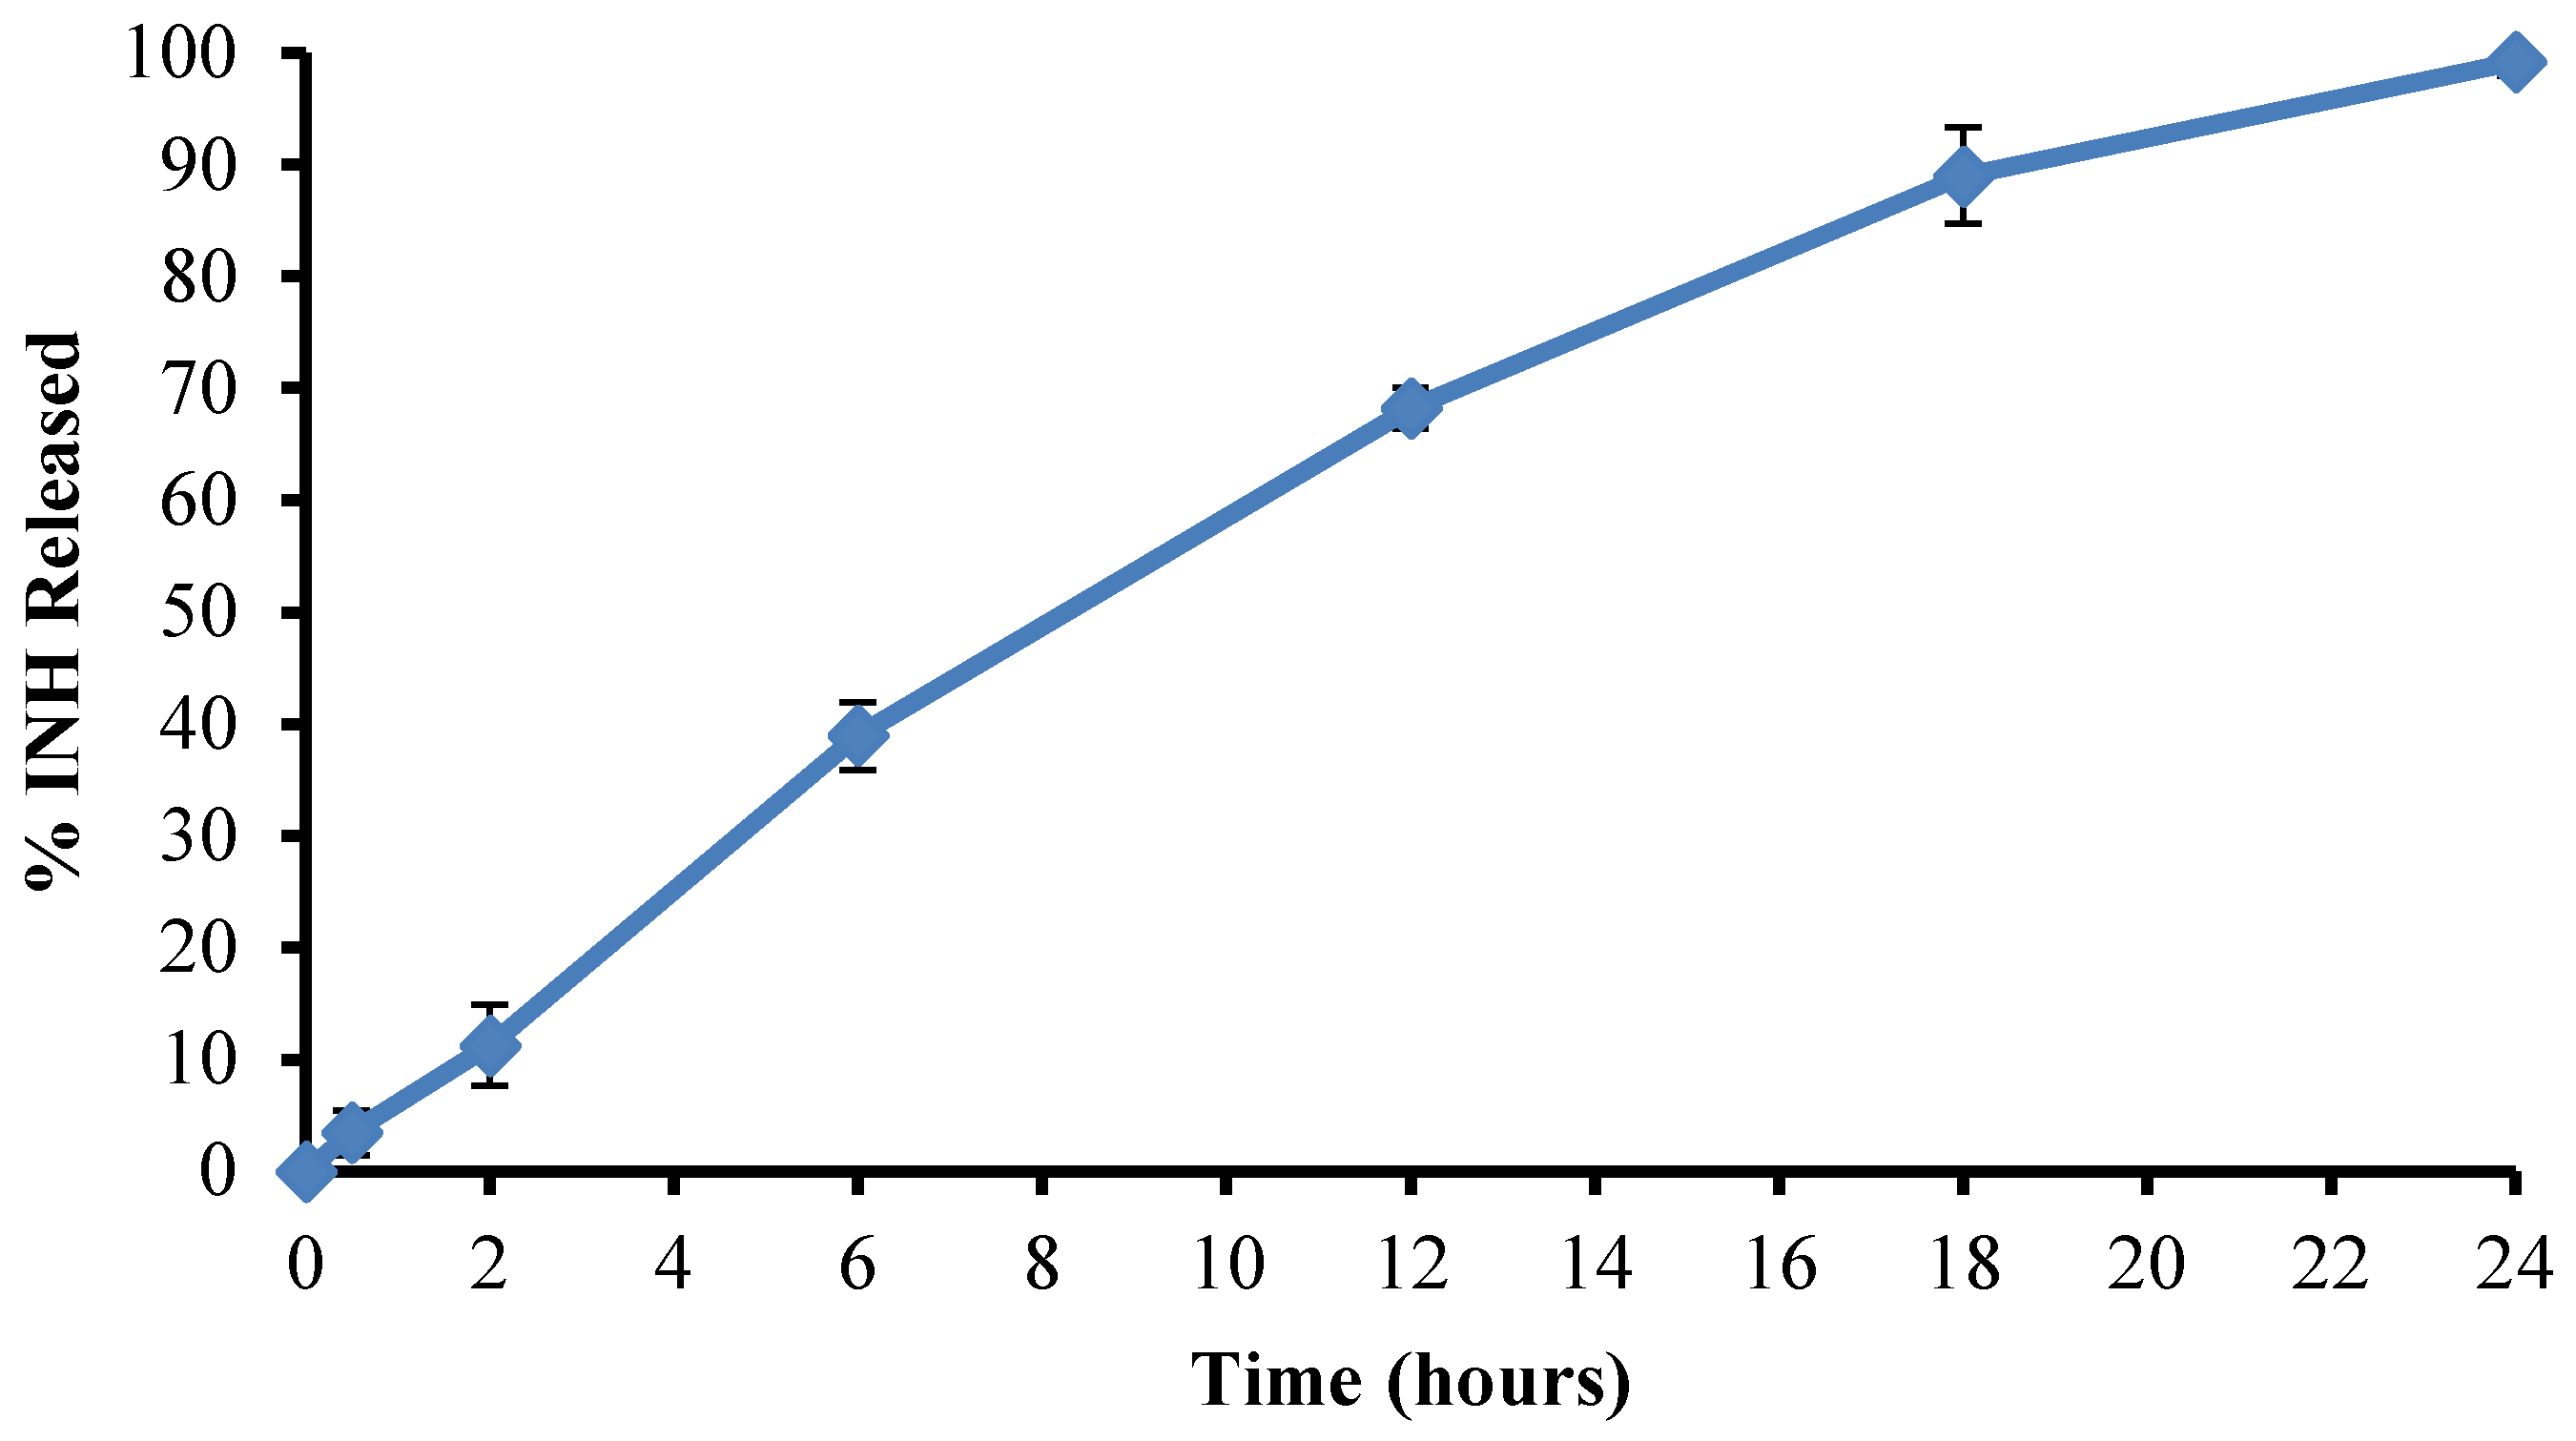 Tab ivermectin 12 mg cost